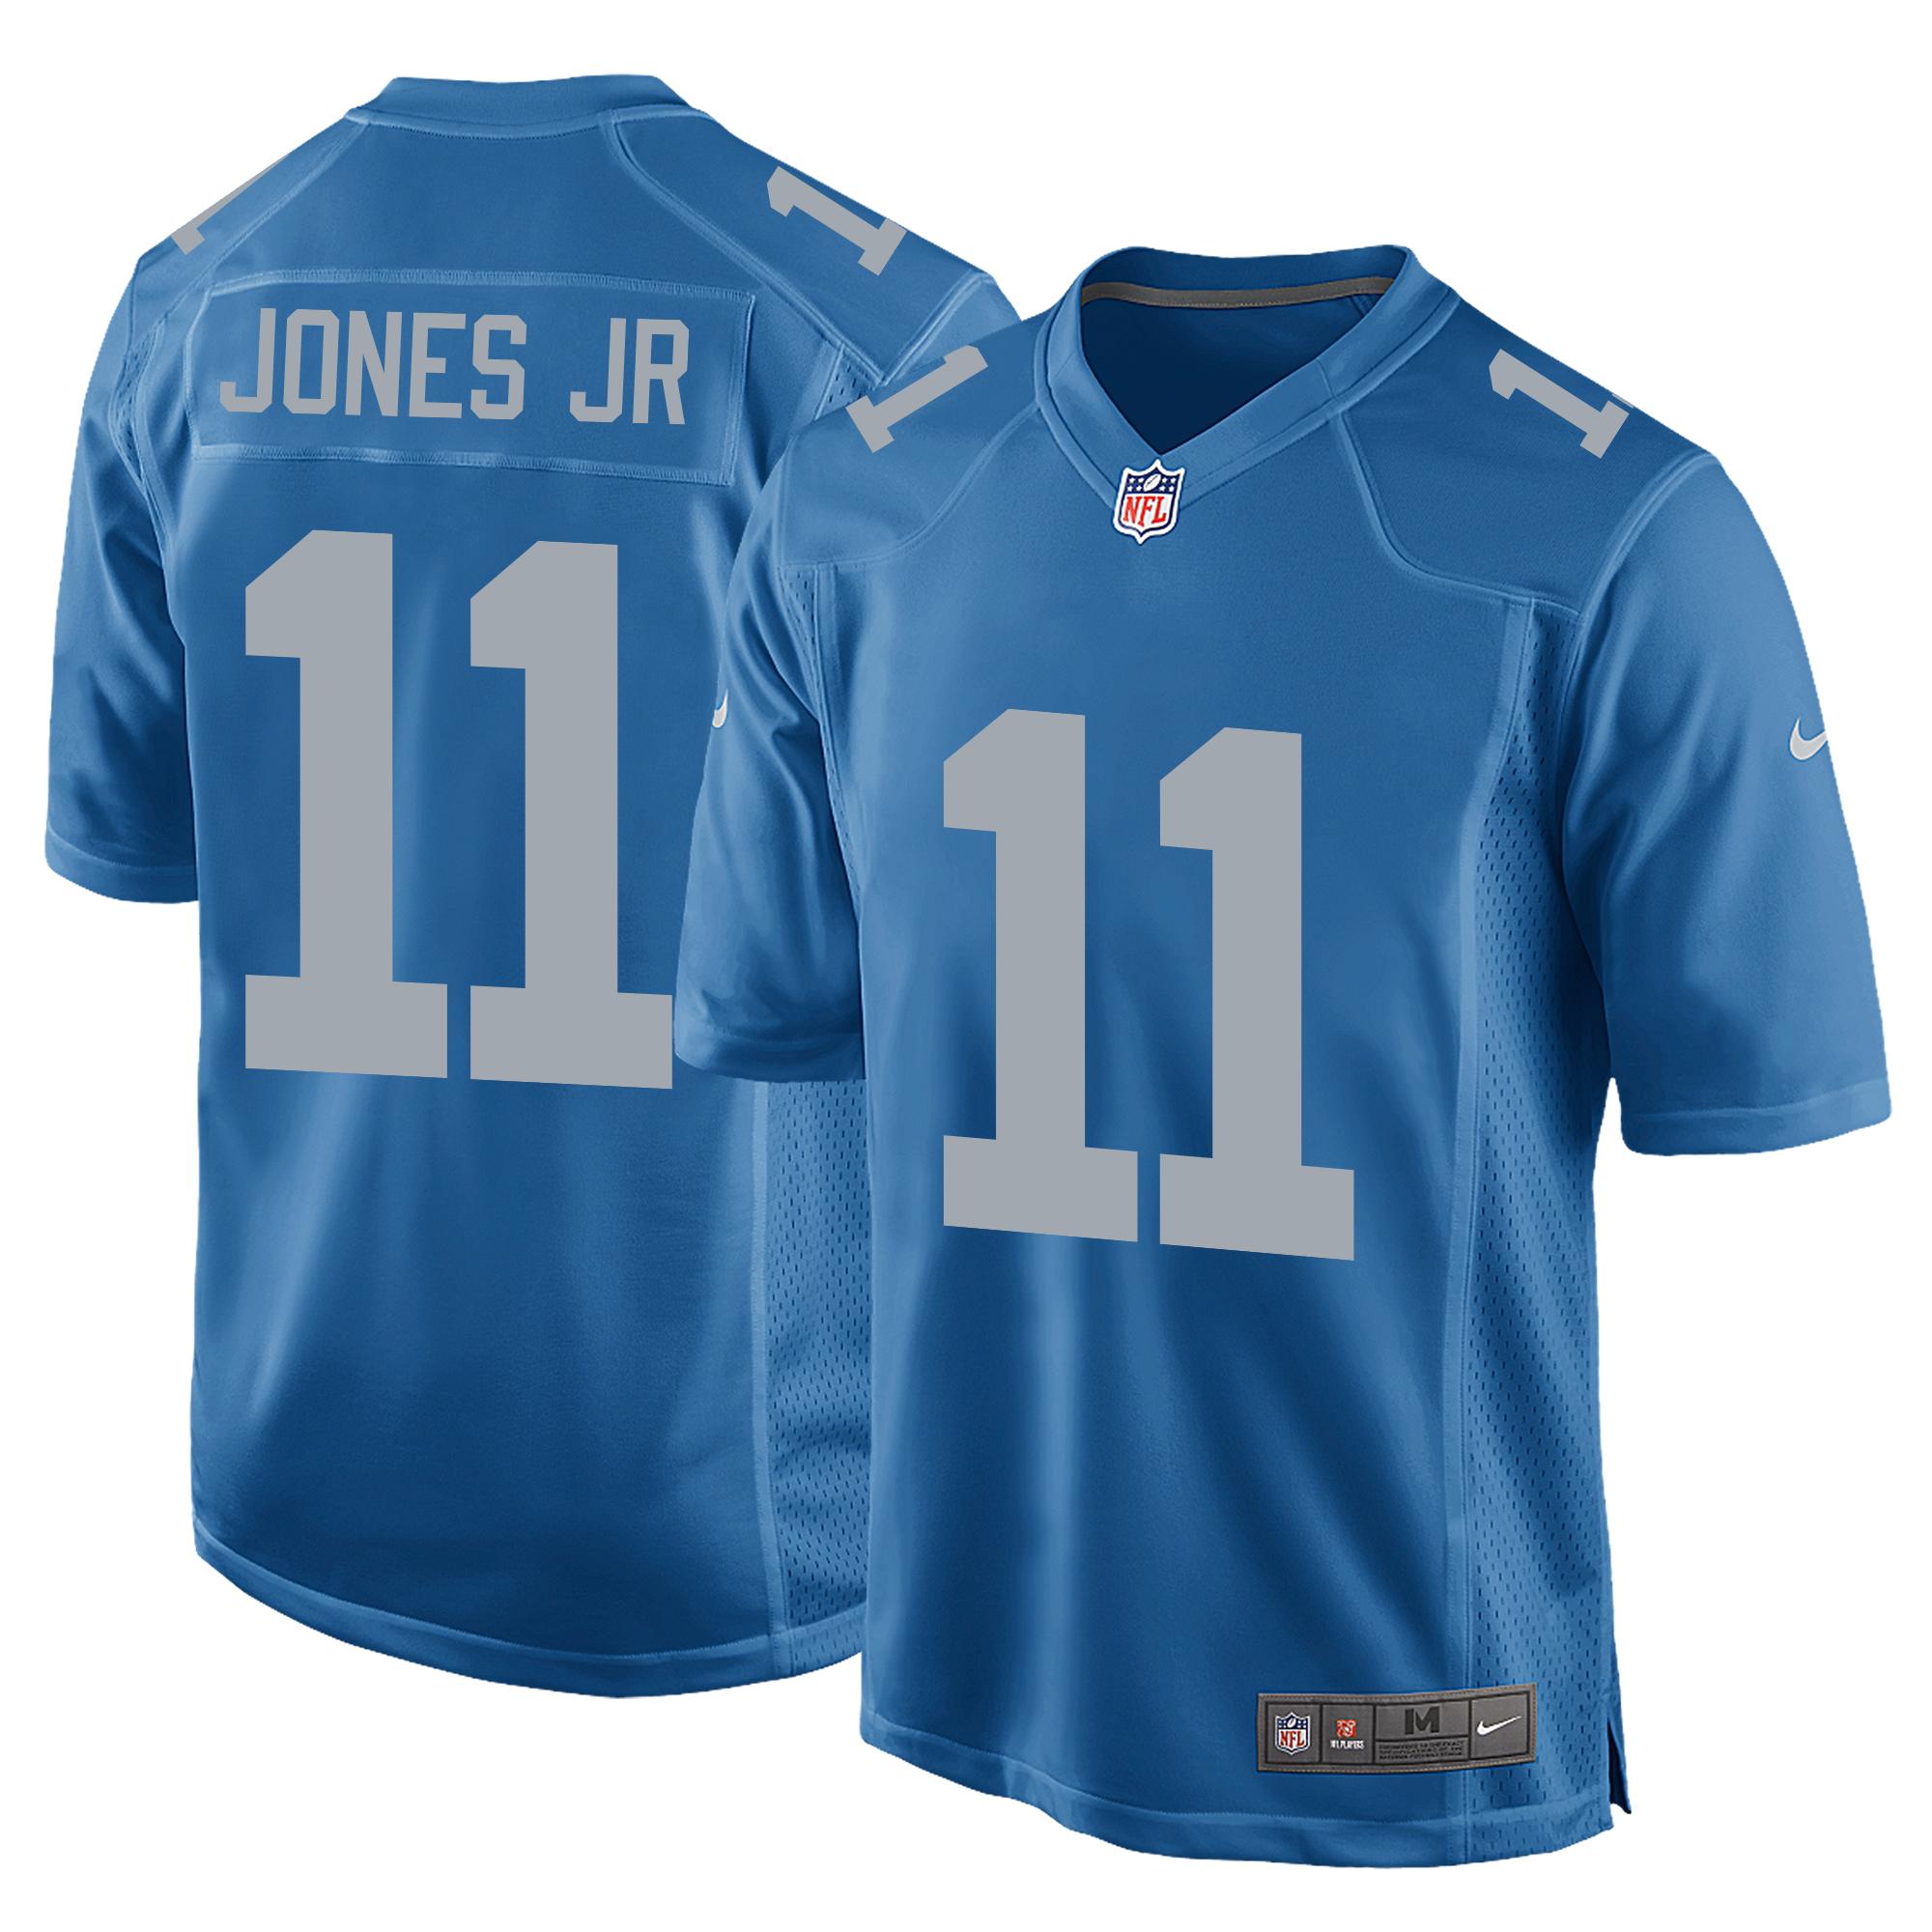 Detroit Lions Ausweichtrikot - Marvin Jones Jr